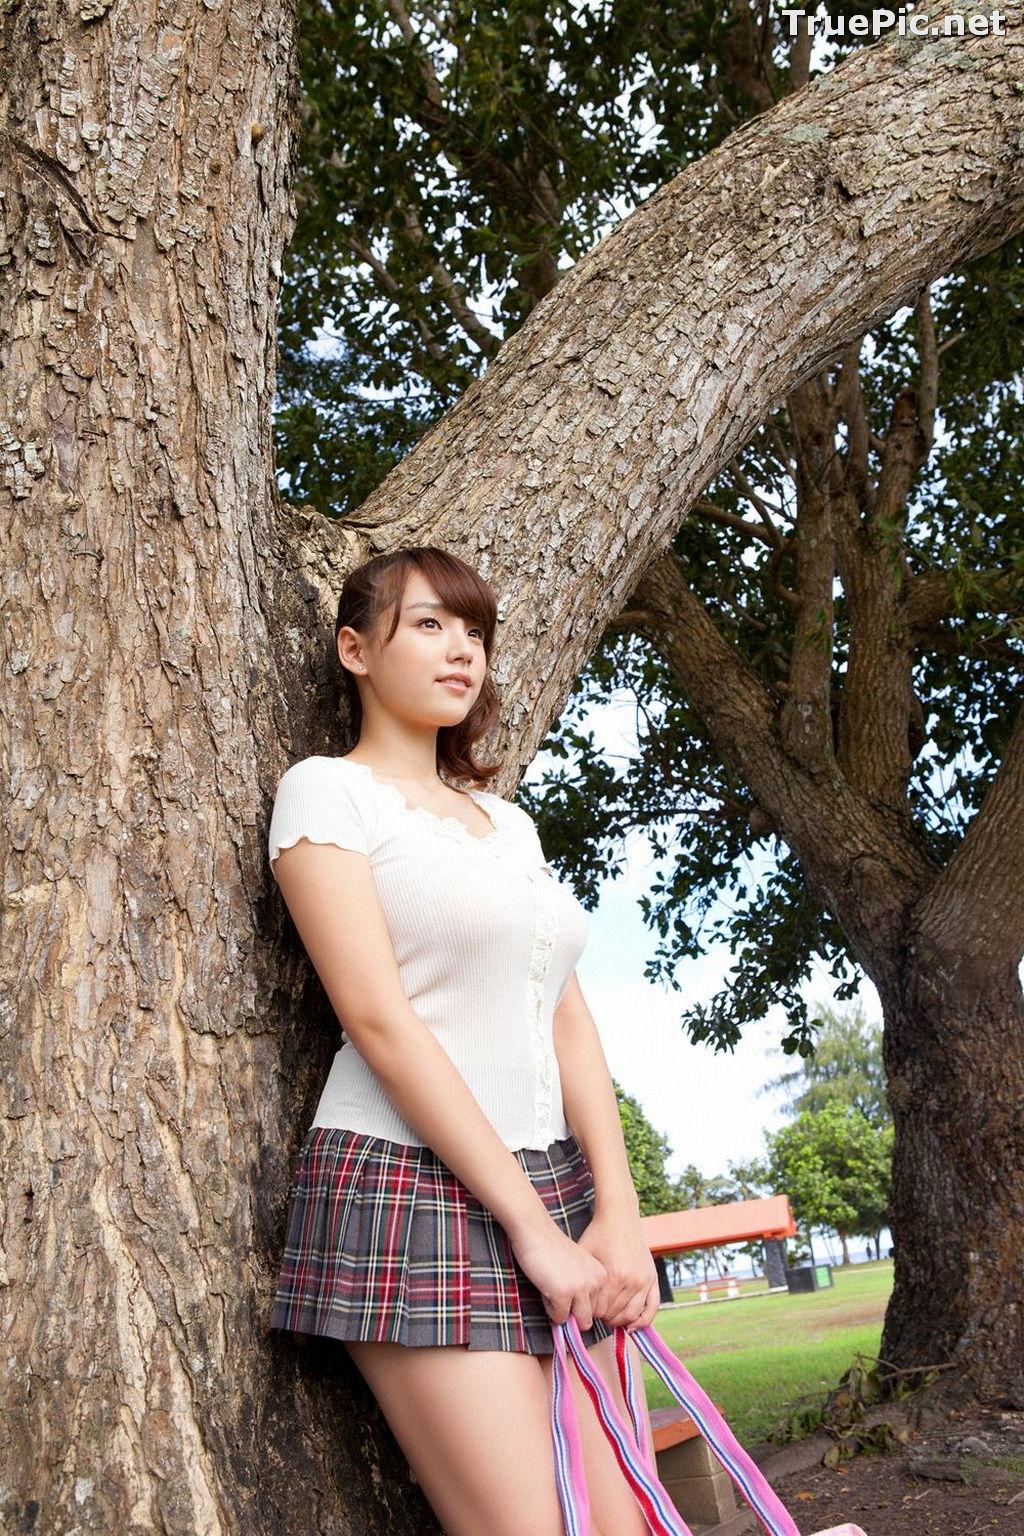 Image [YS Web] Vol.465 – Japanese Model Ai Shinozaki – Mermaid of Love Photo Album - TruePic.net - Picture-3